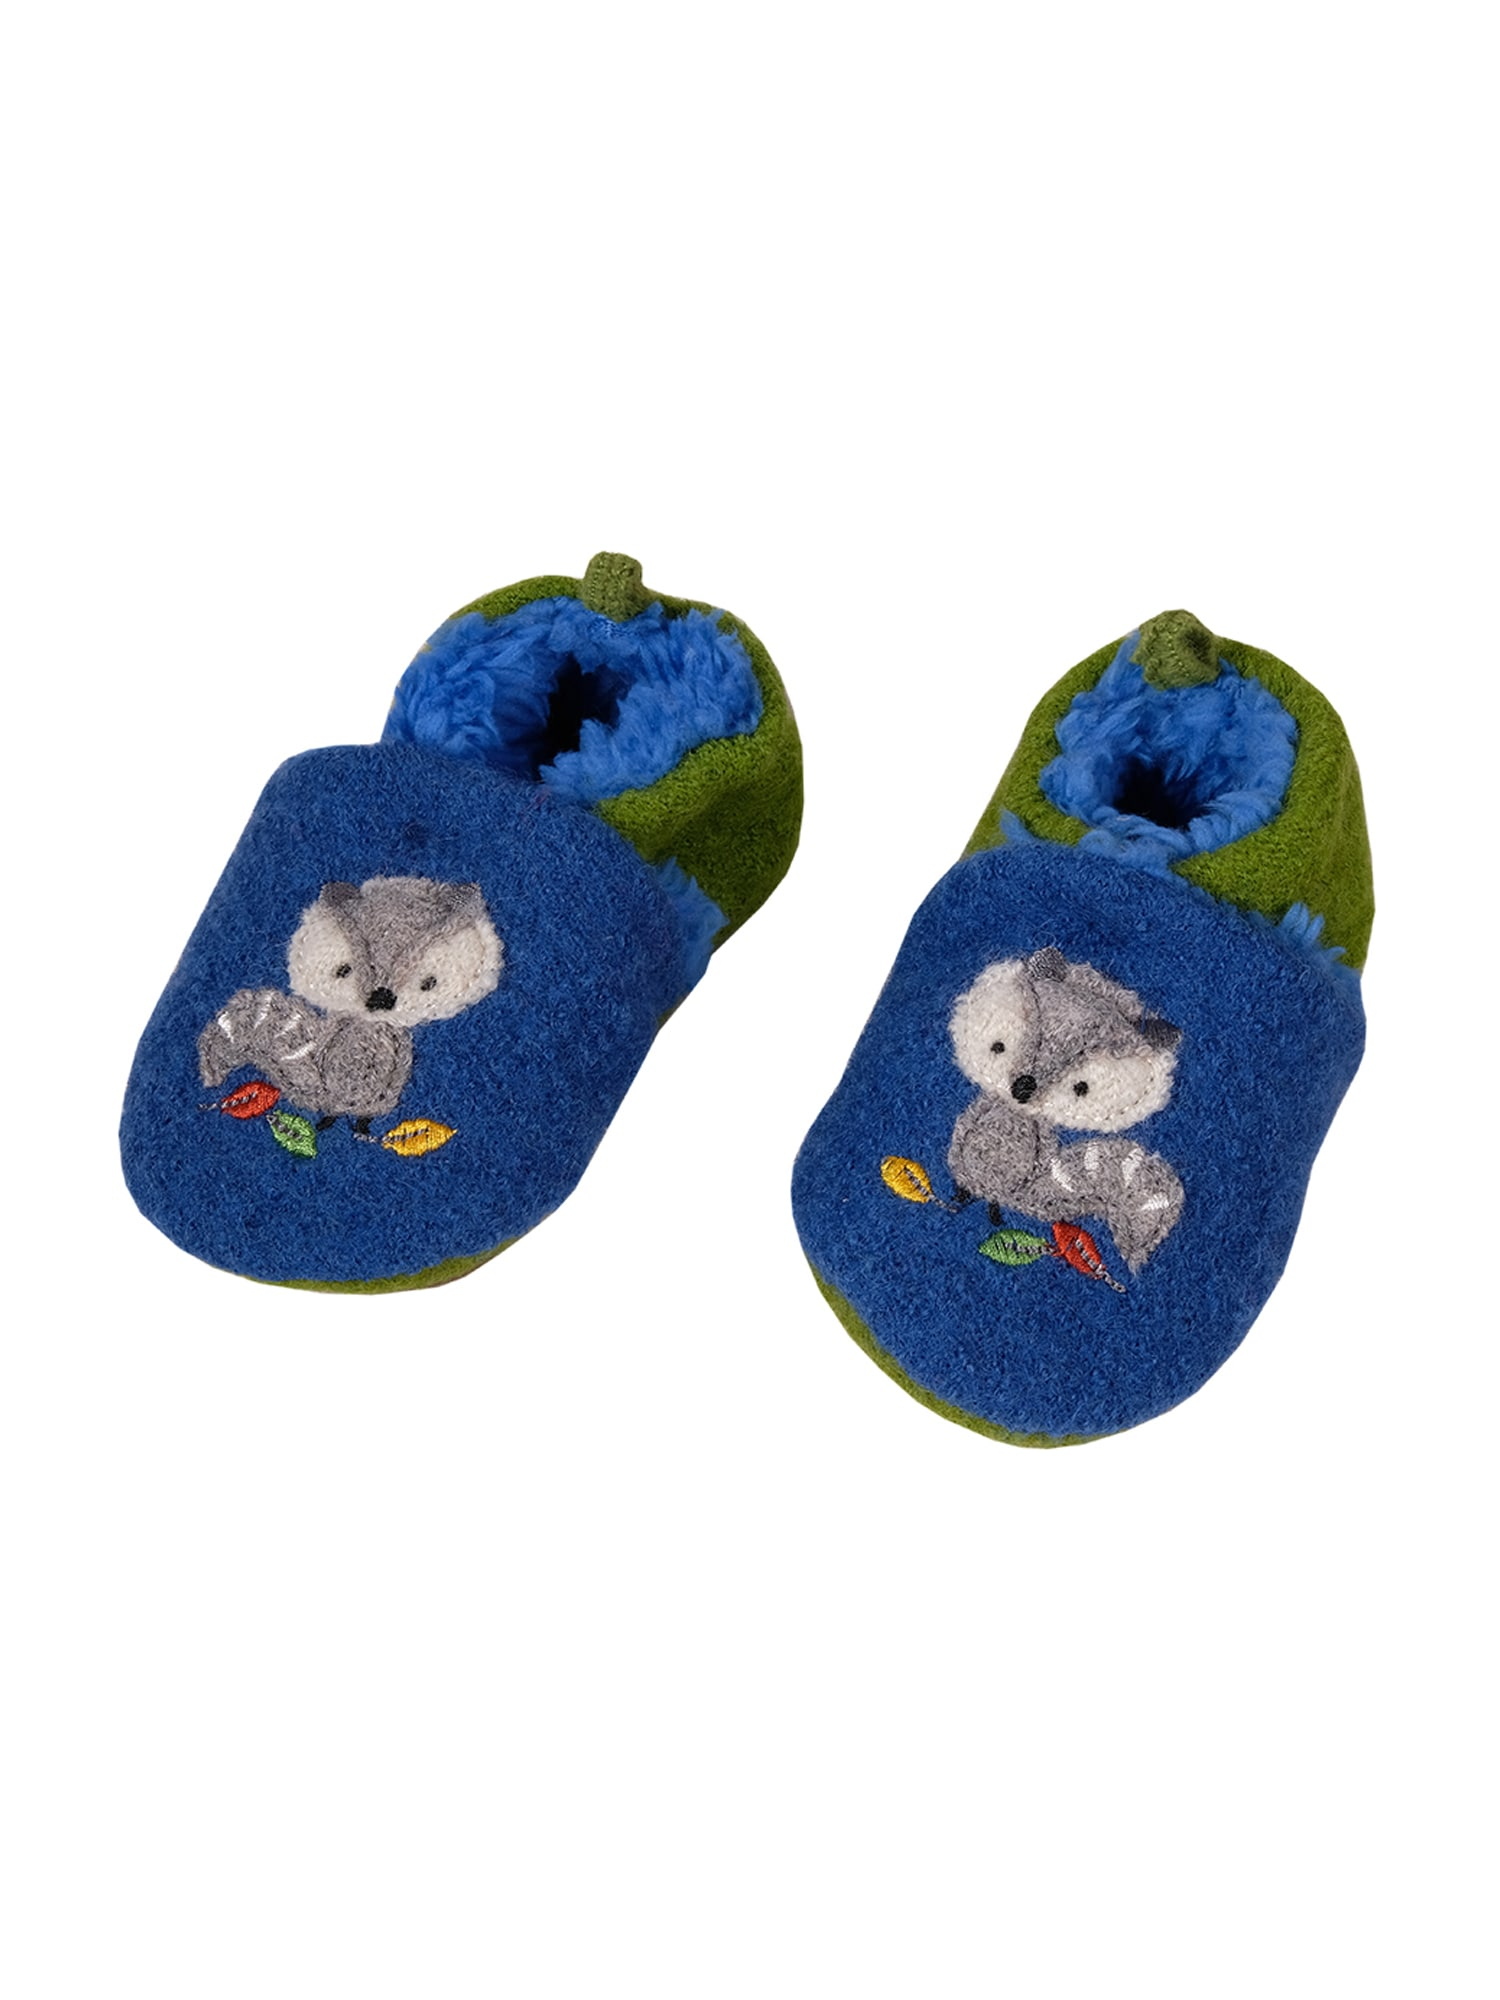 MAXIMO Kūdikiams mėlyna / žalia / mišrios spalvos